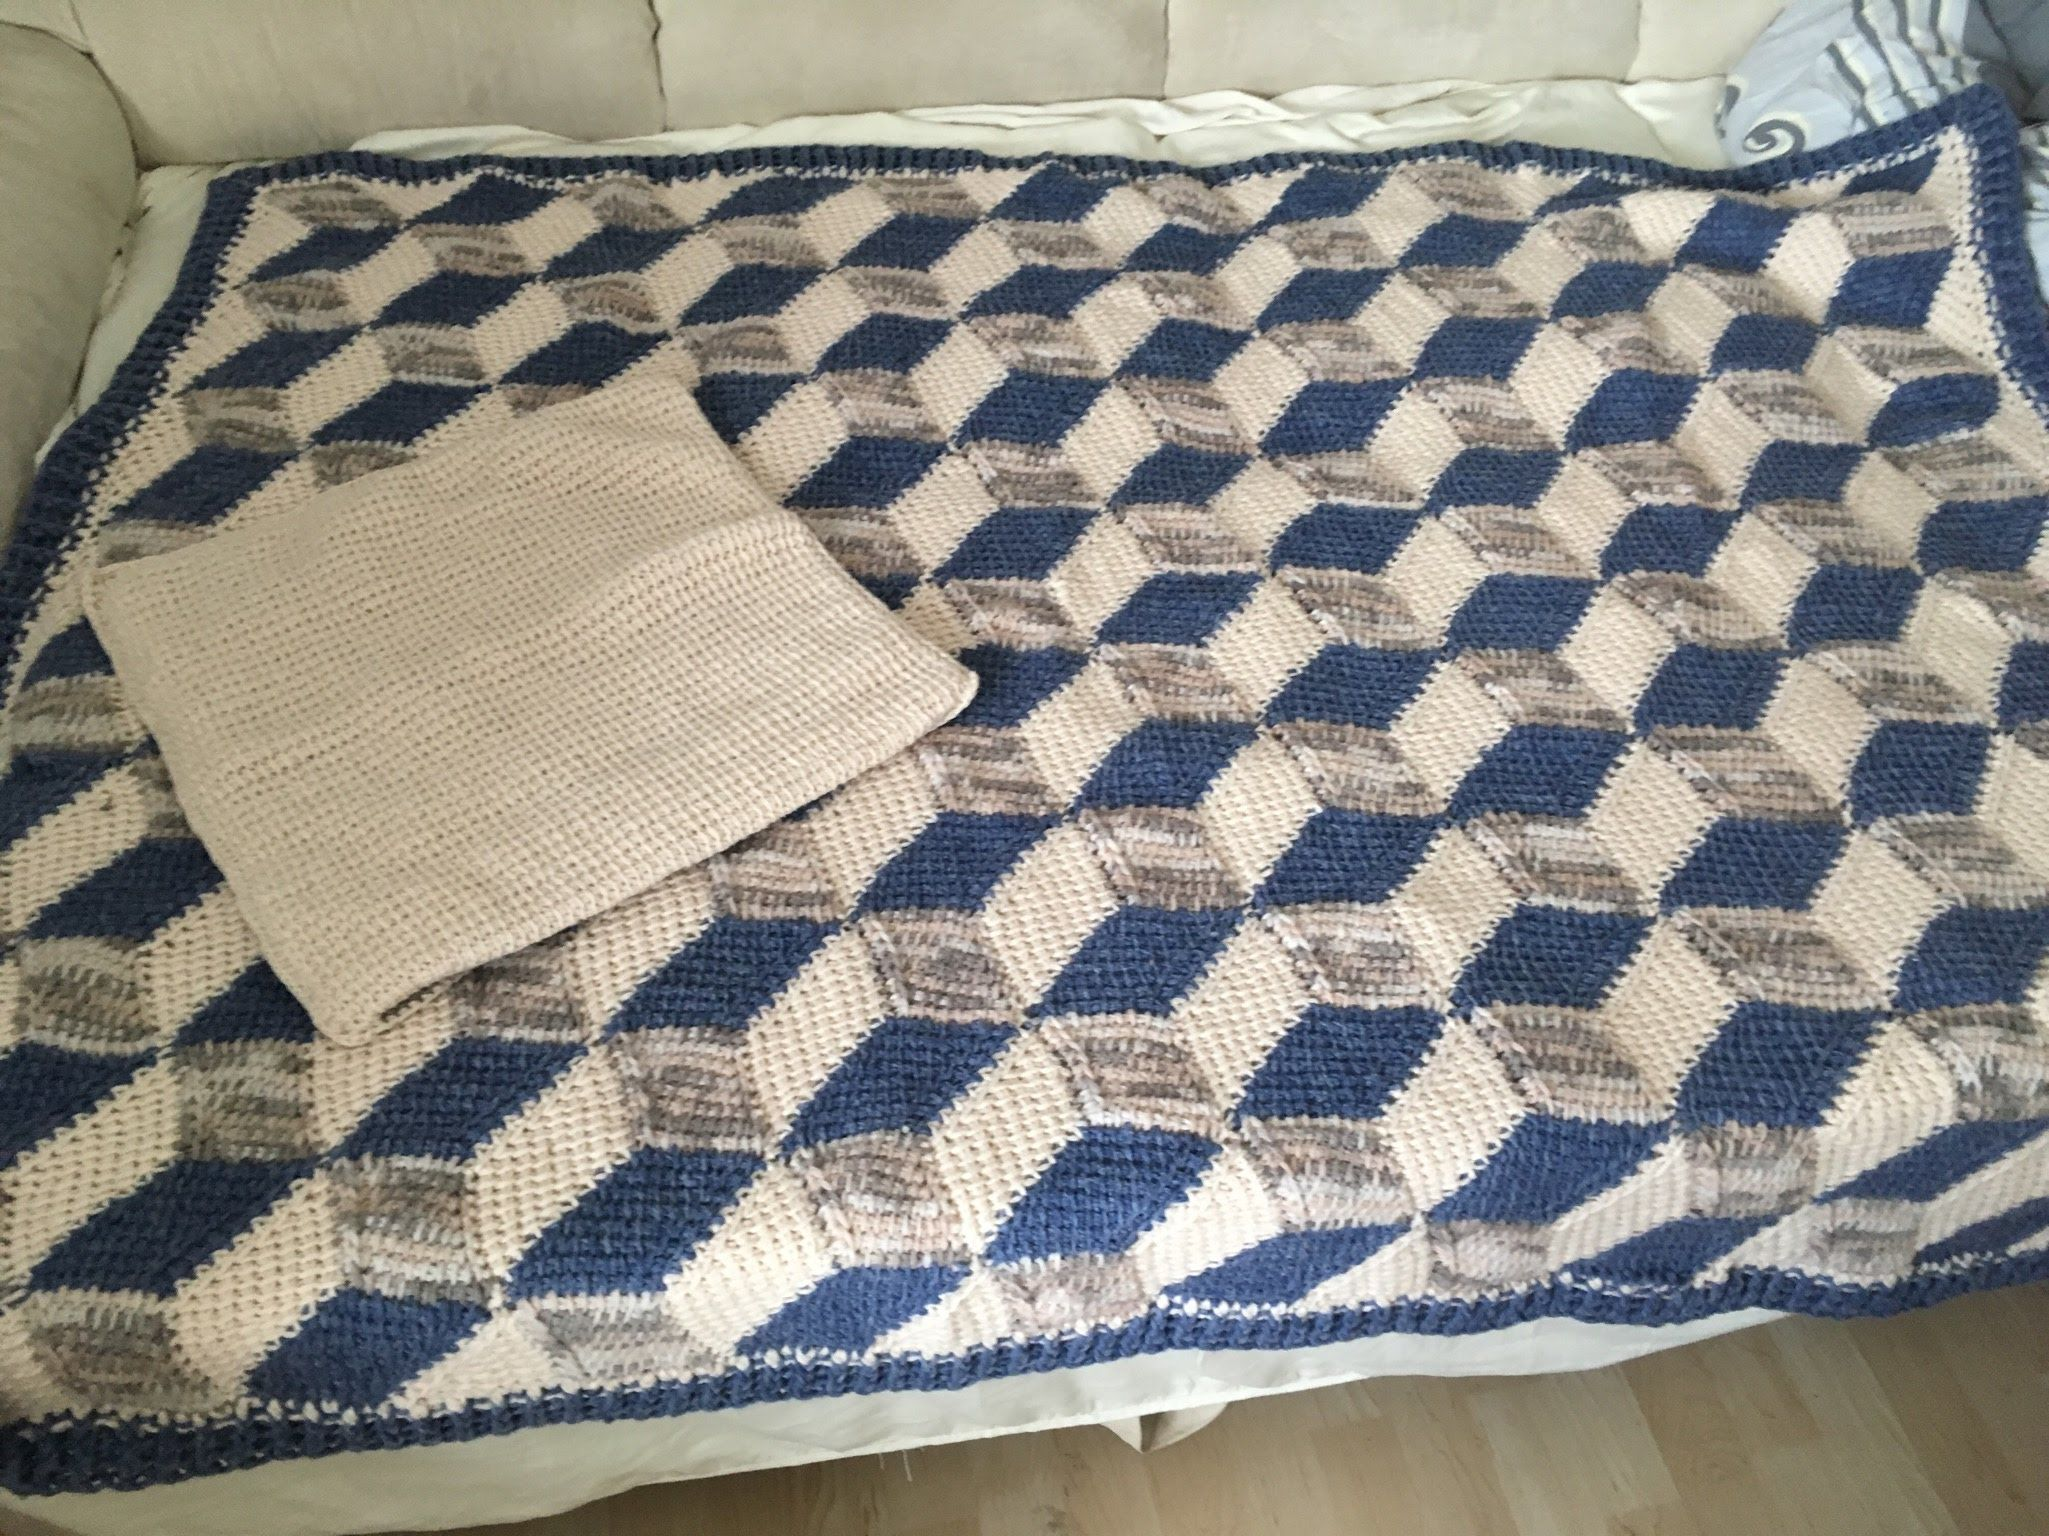 decke eifel 3 d entrelac woolly hugs sheep veronika hug tunesisch h keln tunisian crochet. Black Bedroom Furniture Sets. Home Design Ideas